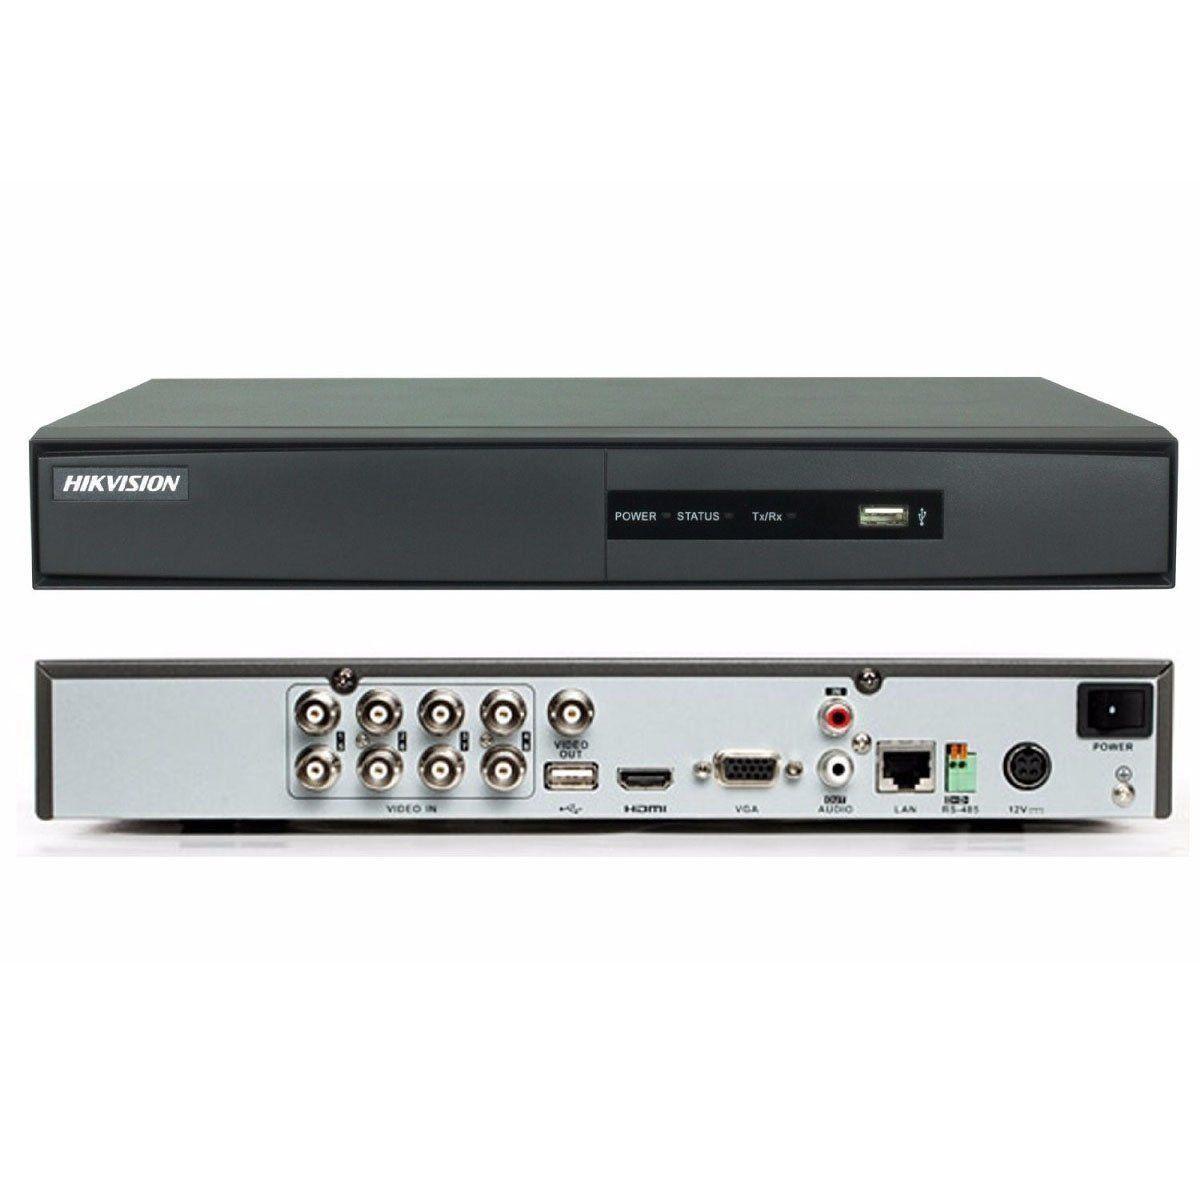 DVR 8 Canais Digital Turbo HD DS-7208HGHI-F1/N Hikvision